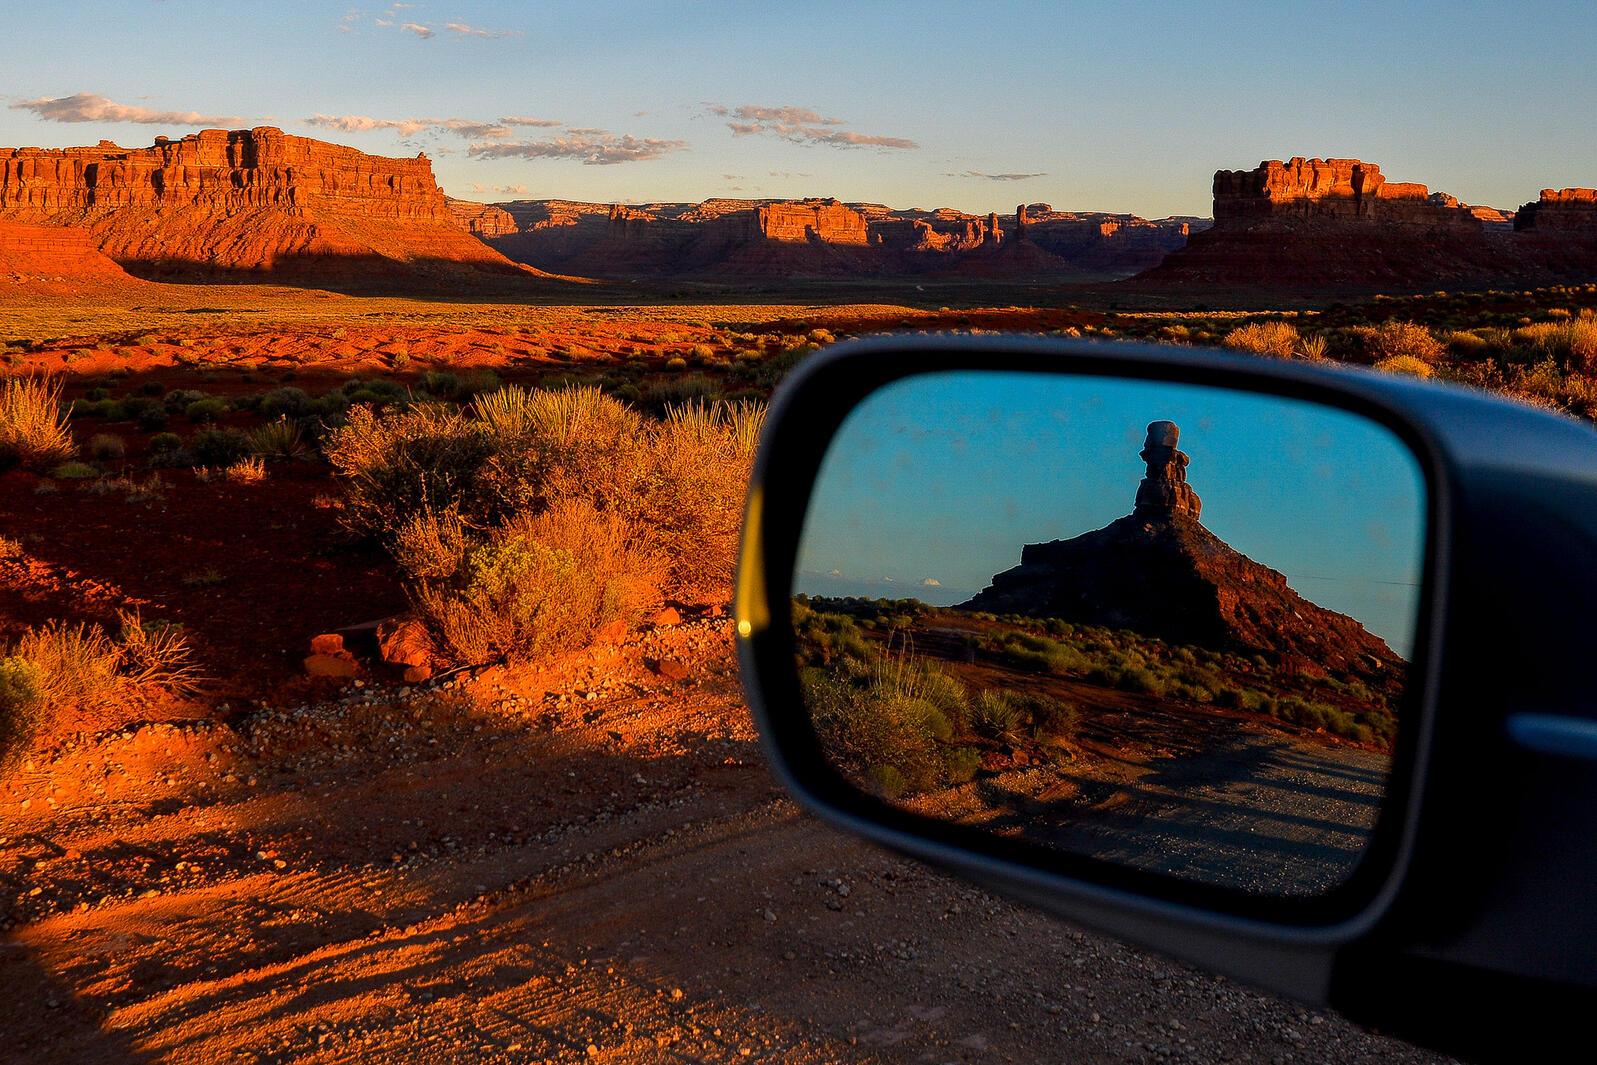 The sun rises over the Valley of The Gods inside Bears Ears National Monument, Utah. Alex Goodlett/The New York Times/Redux